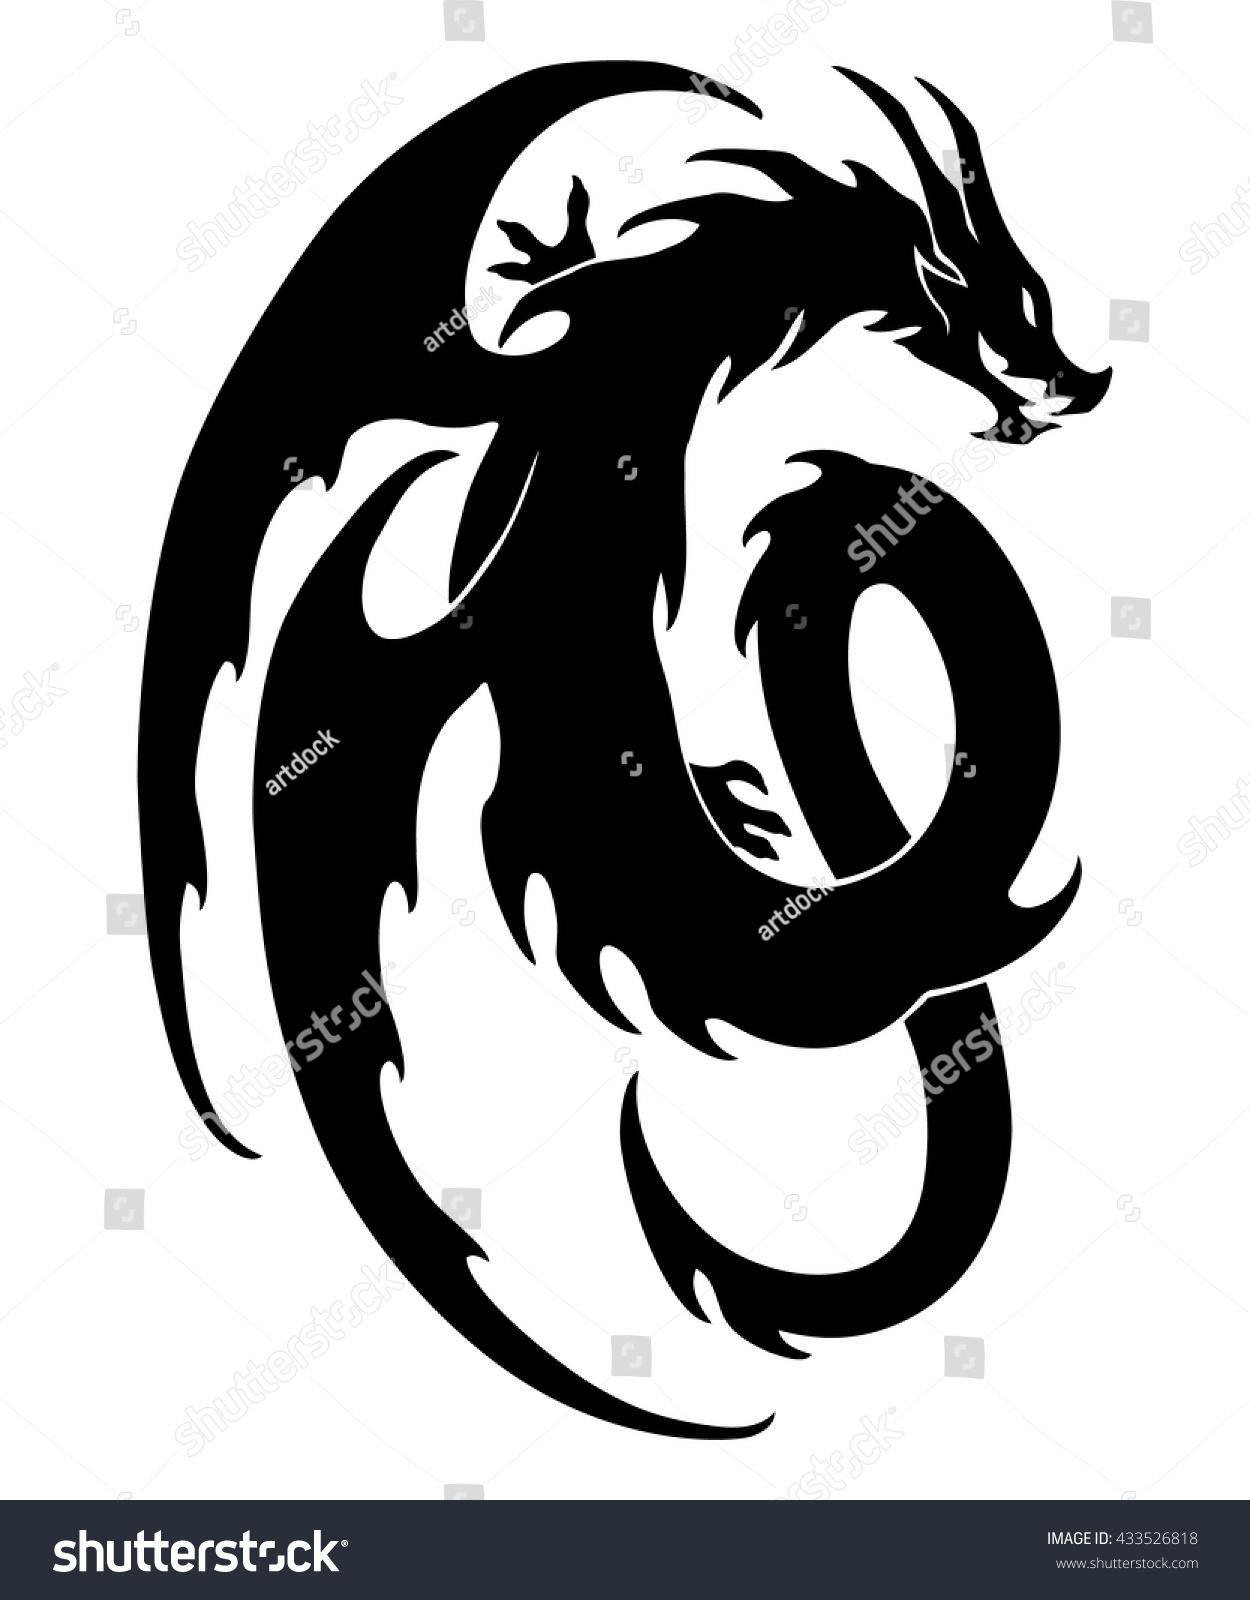 Vector illustration dragon design black and white graphics